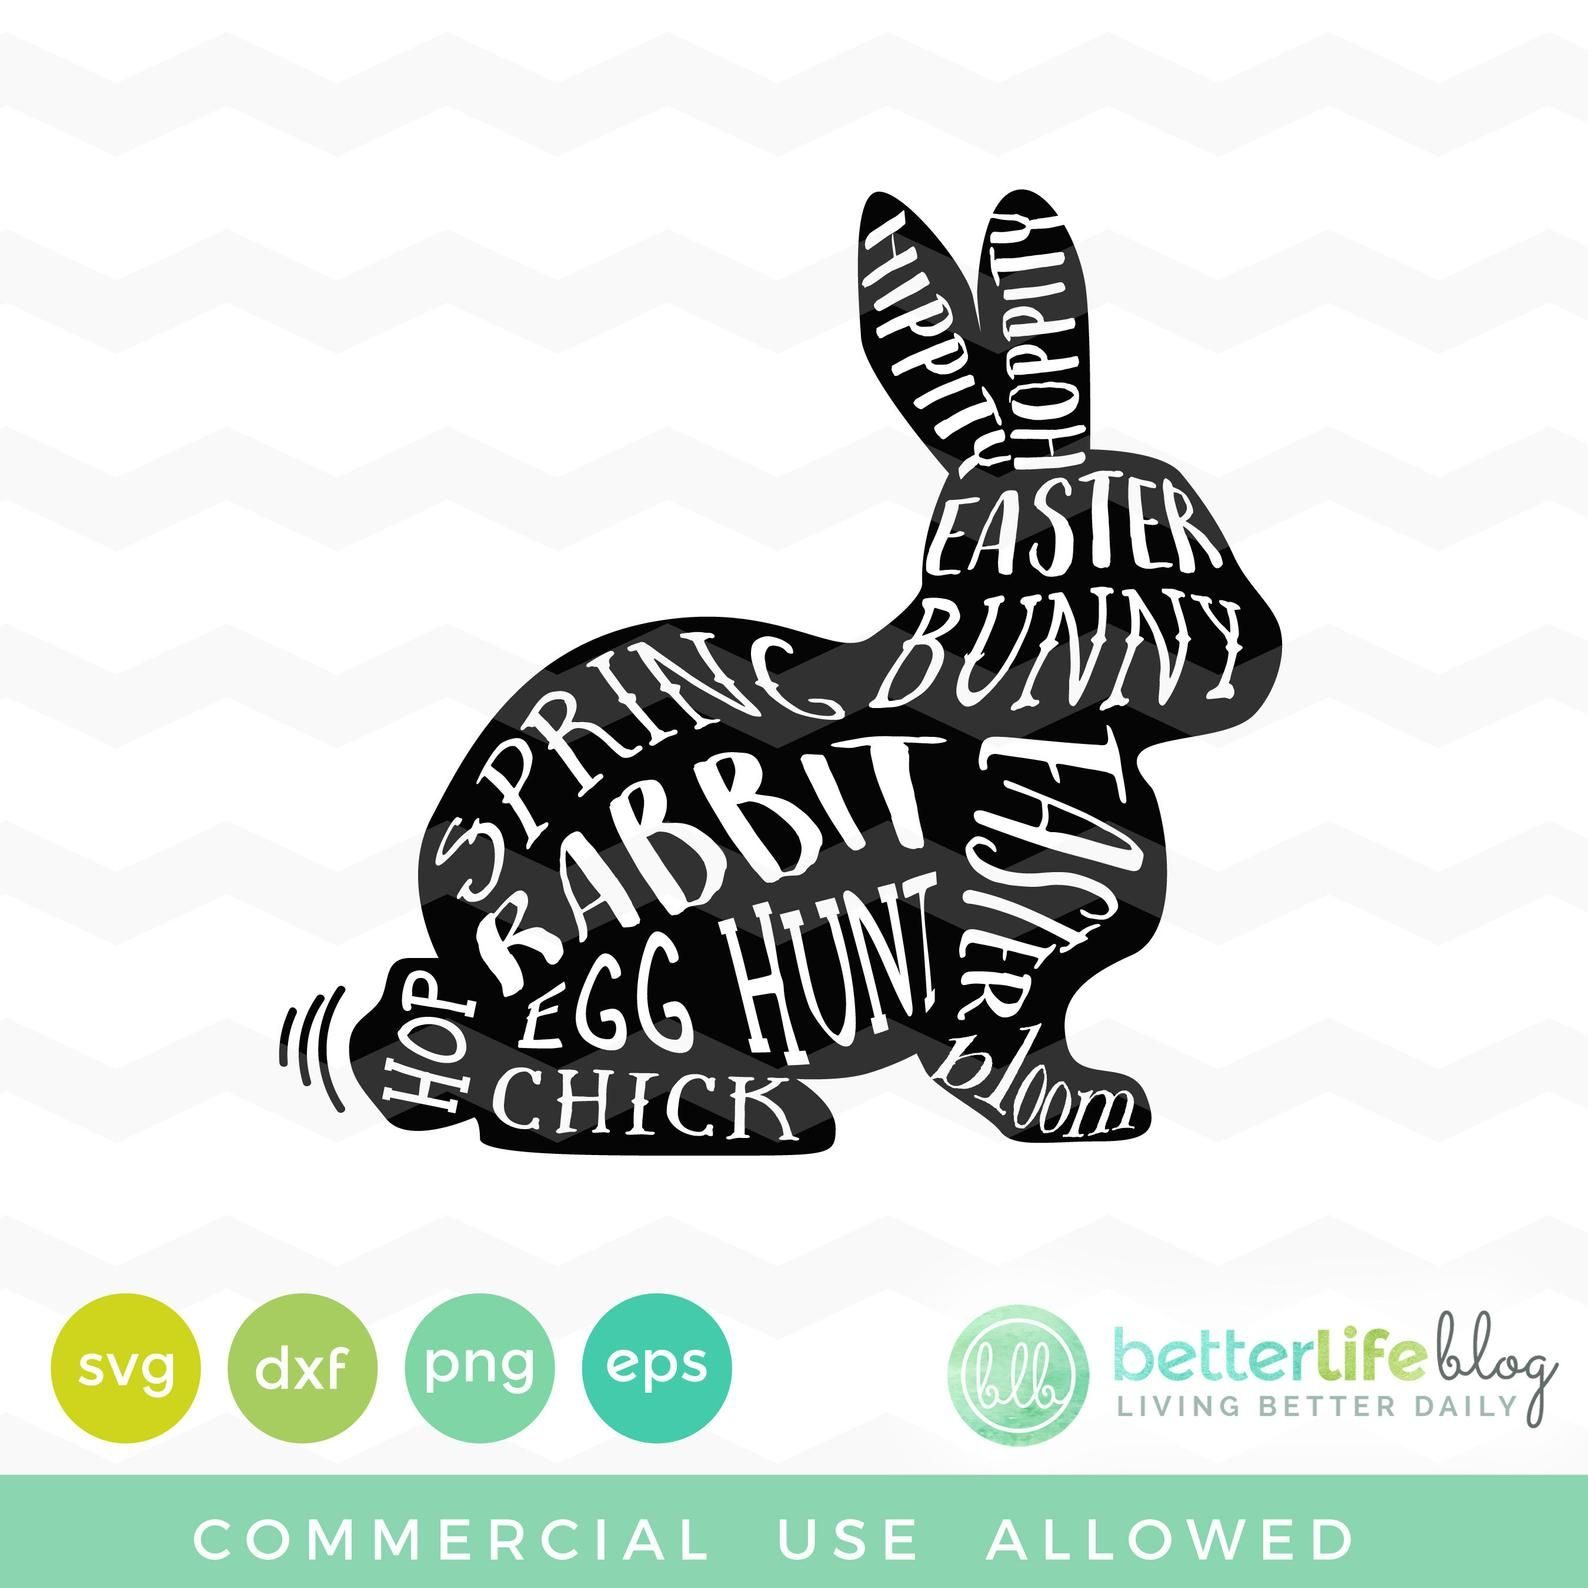 Eps Bunny Ears Silhouette PNG DXF Happy Easter SVG Digital Cut File Jpg Cricut Print File Easter